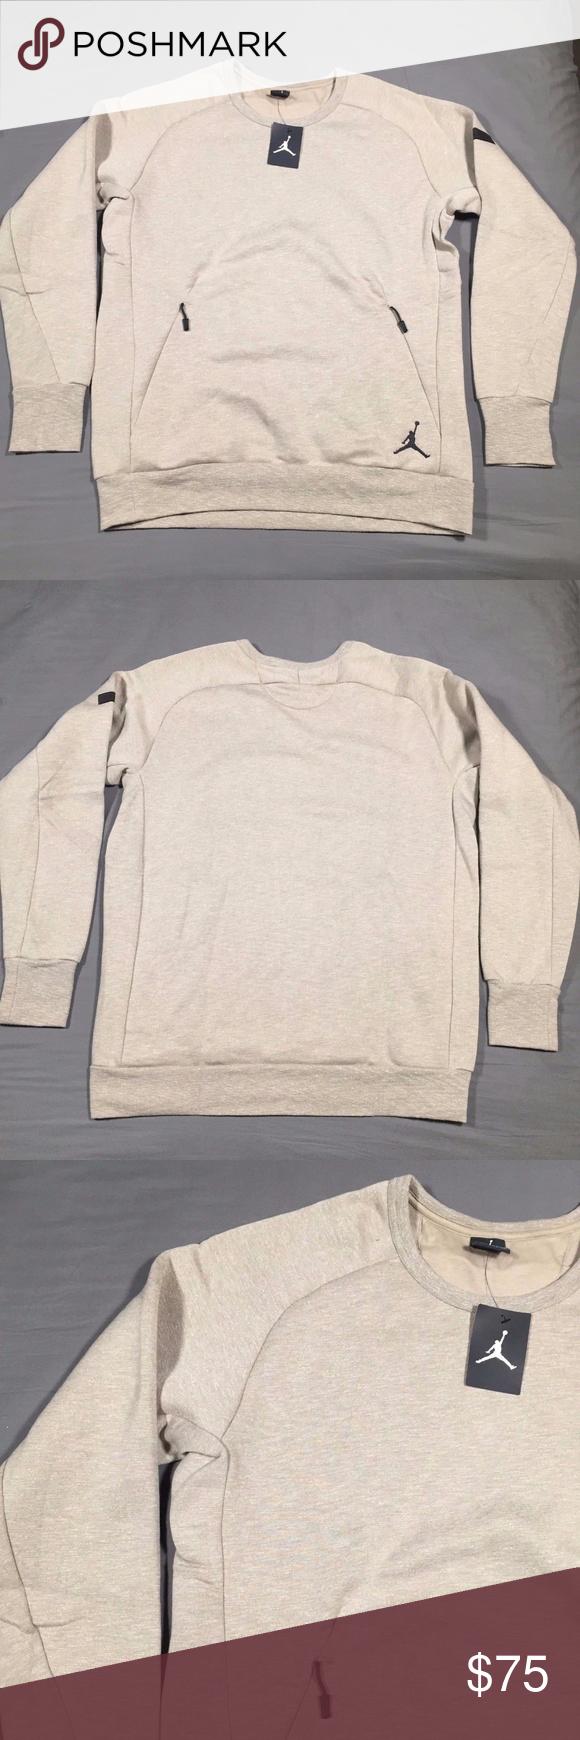 39d53ef690375f Air Jordan Icon Fleece Crew Sweatshirt 802181 235 New Men s Nike Air Jordan  Icon Fleece Crew